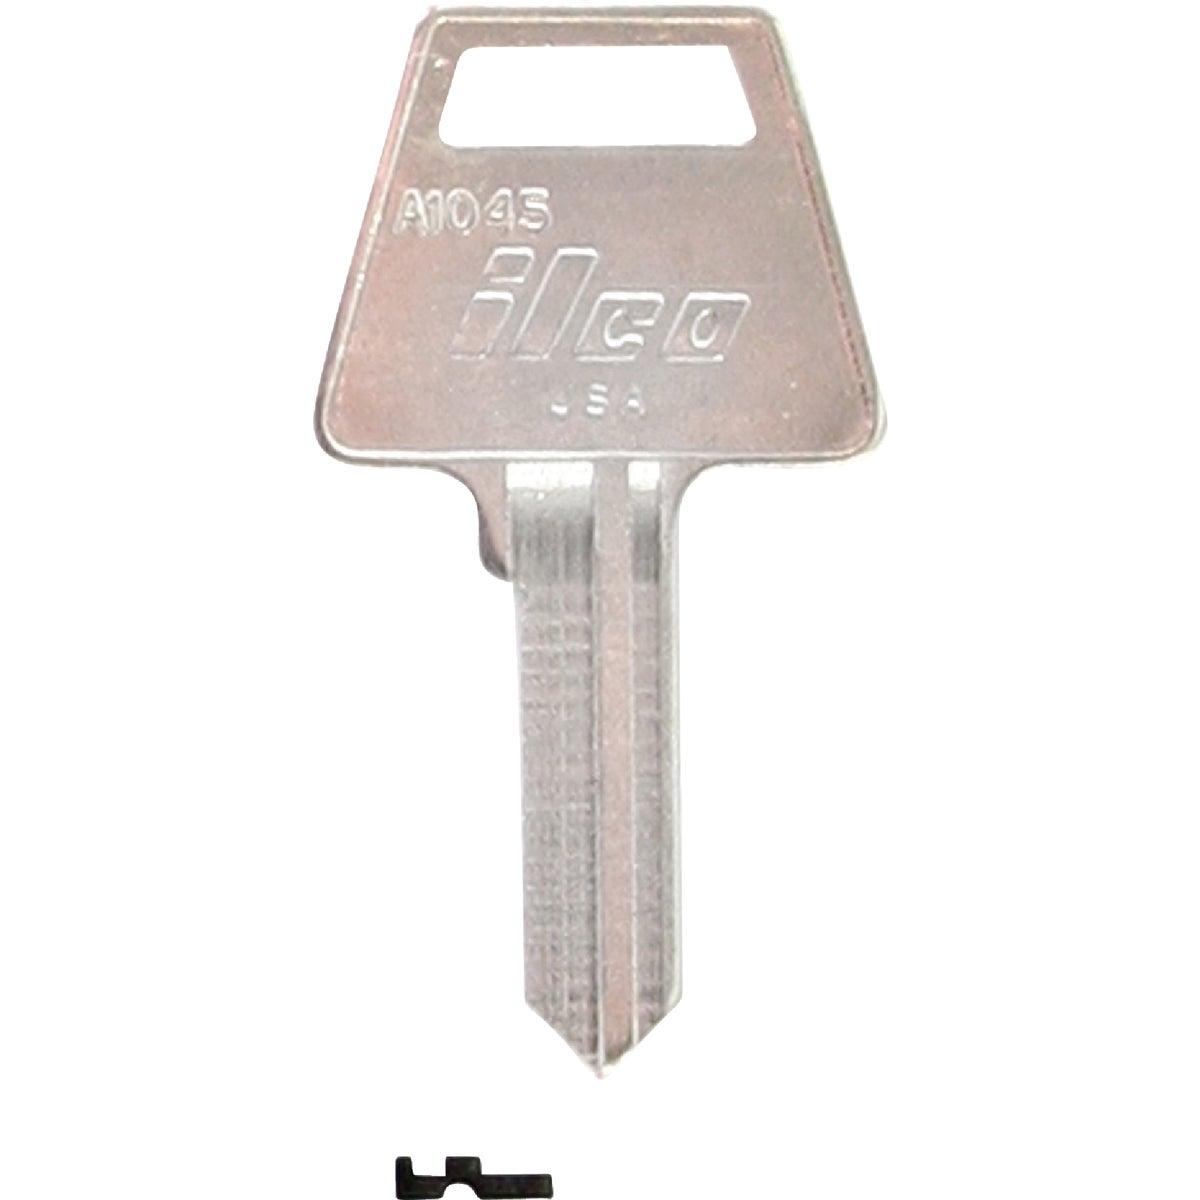 A1045 AMERCN PADLOCK KEY - A1045 by Ilco Corp